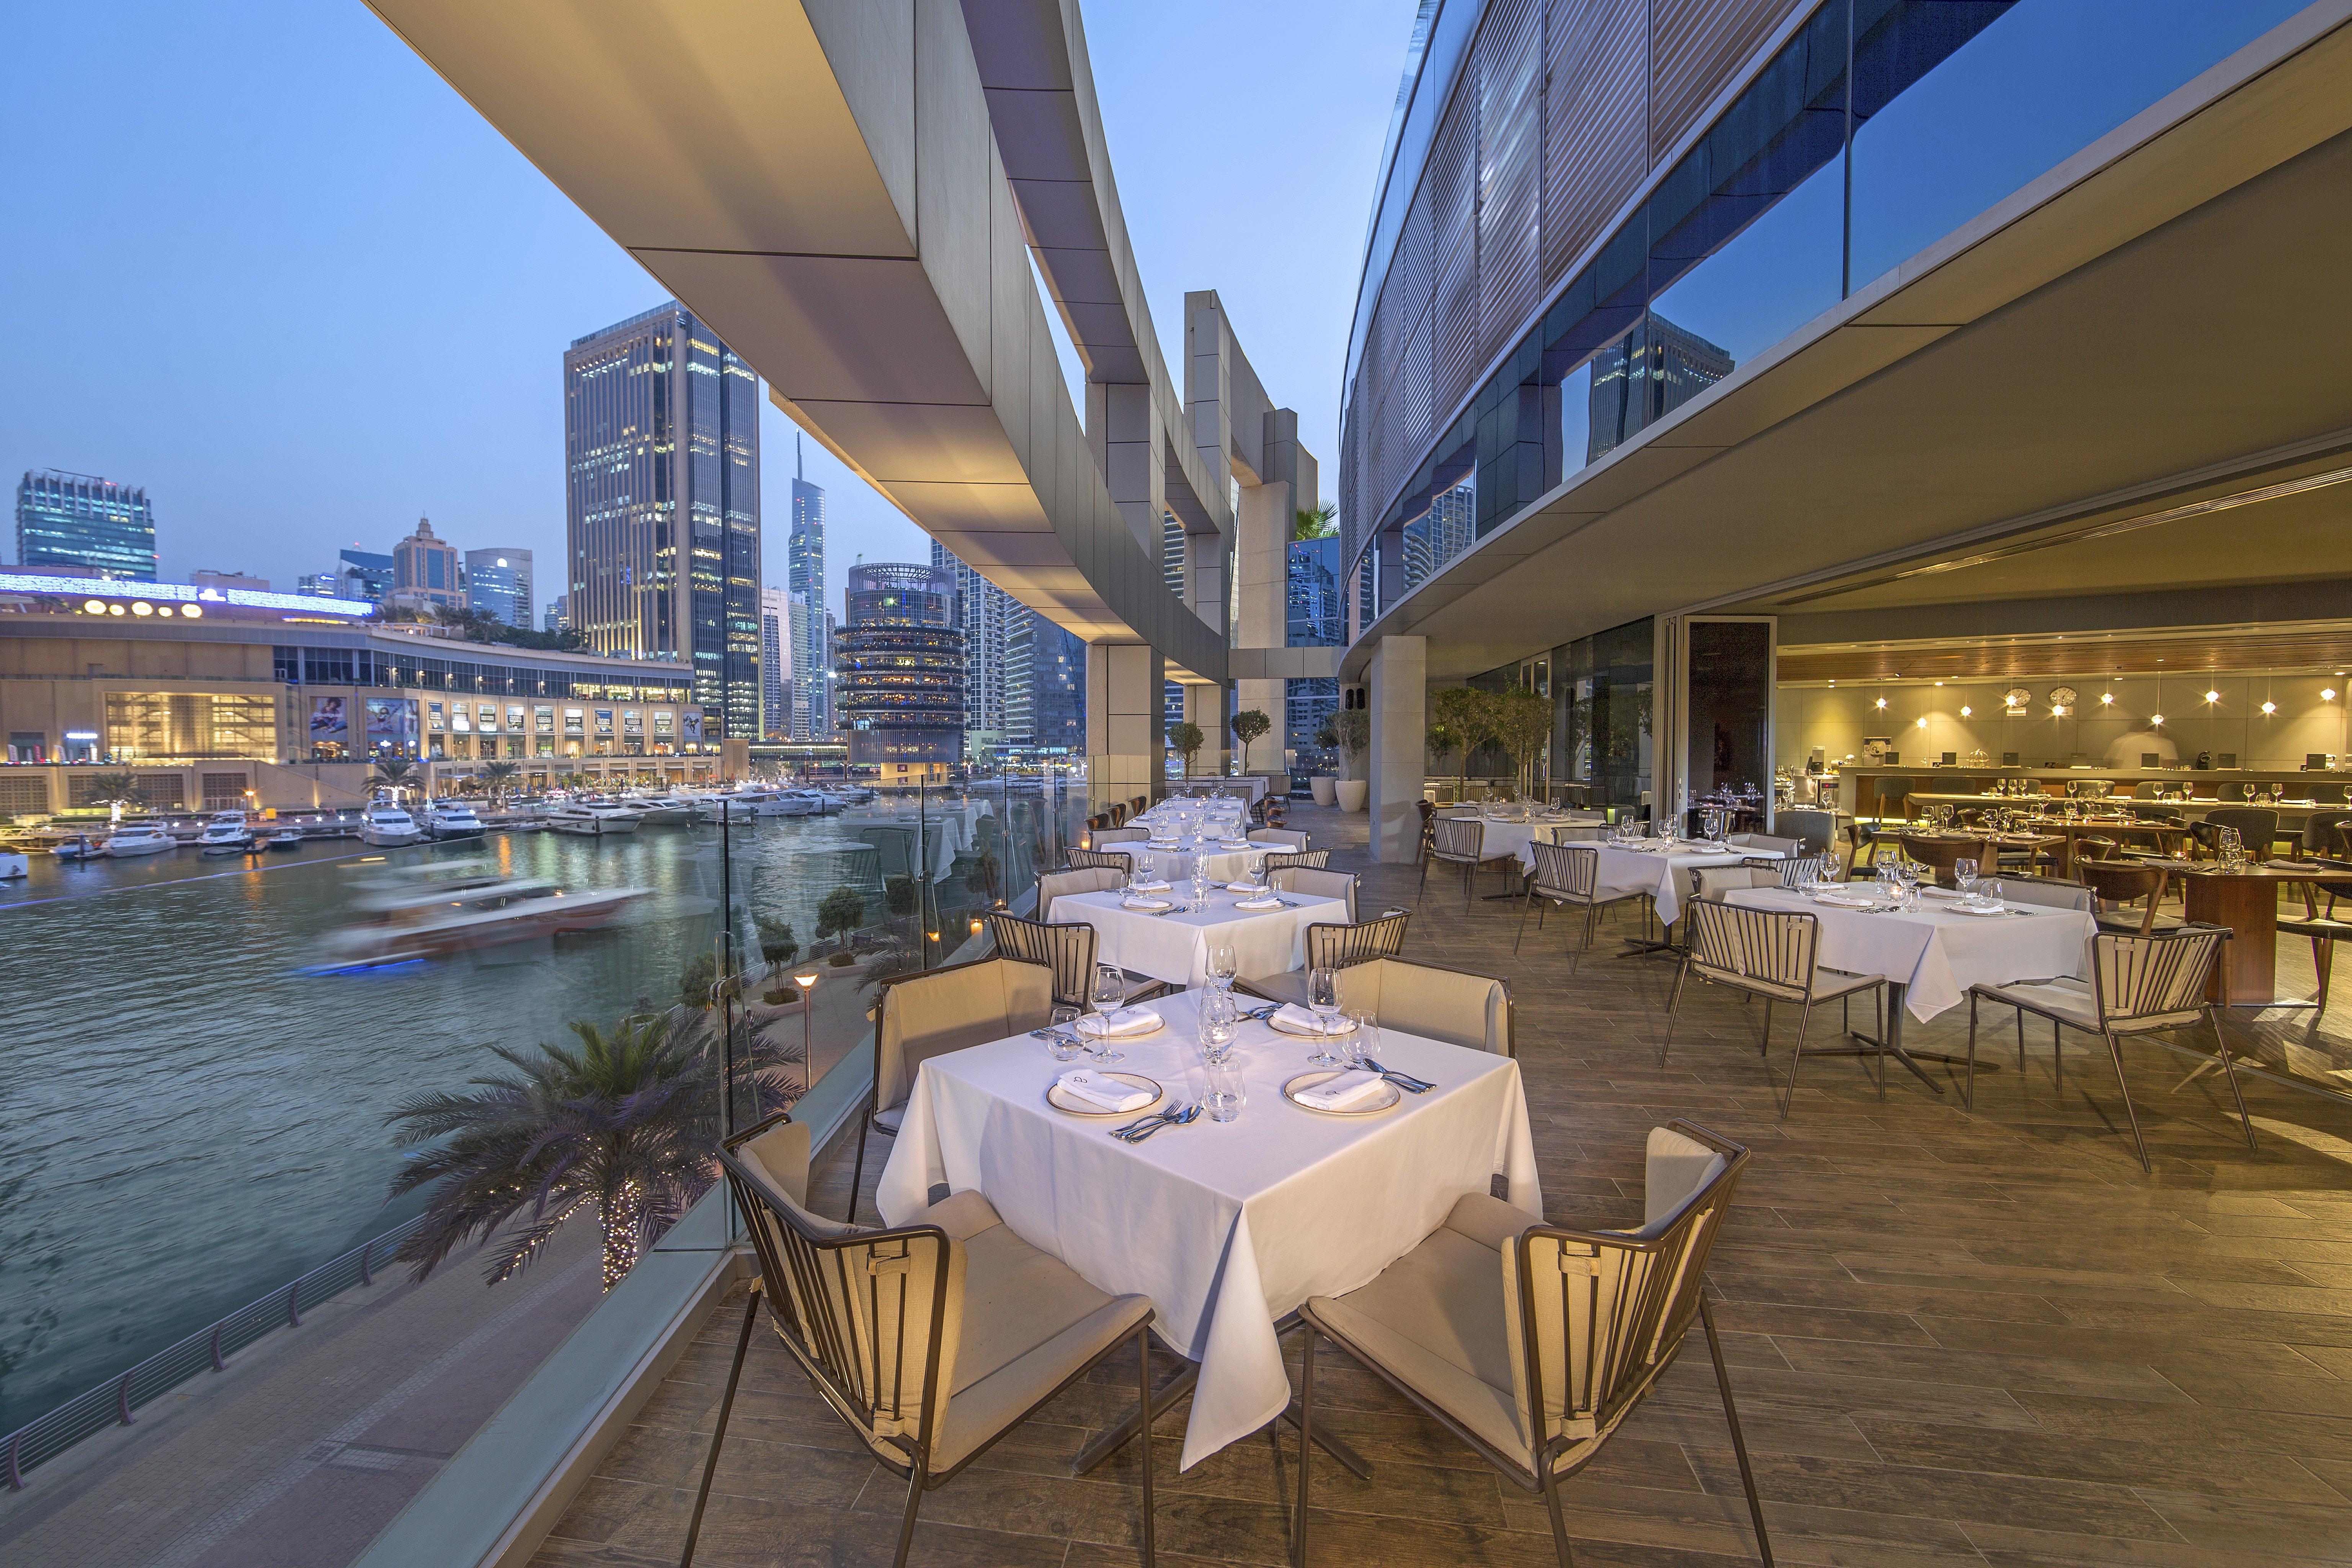 Marina Social Dubai Offers Delicious Dining Experience For European Cuisine Enthusiasts